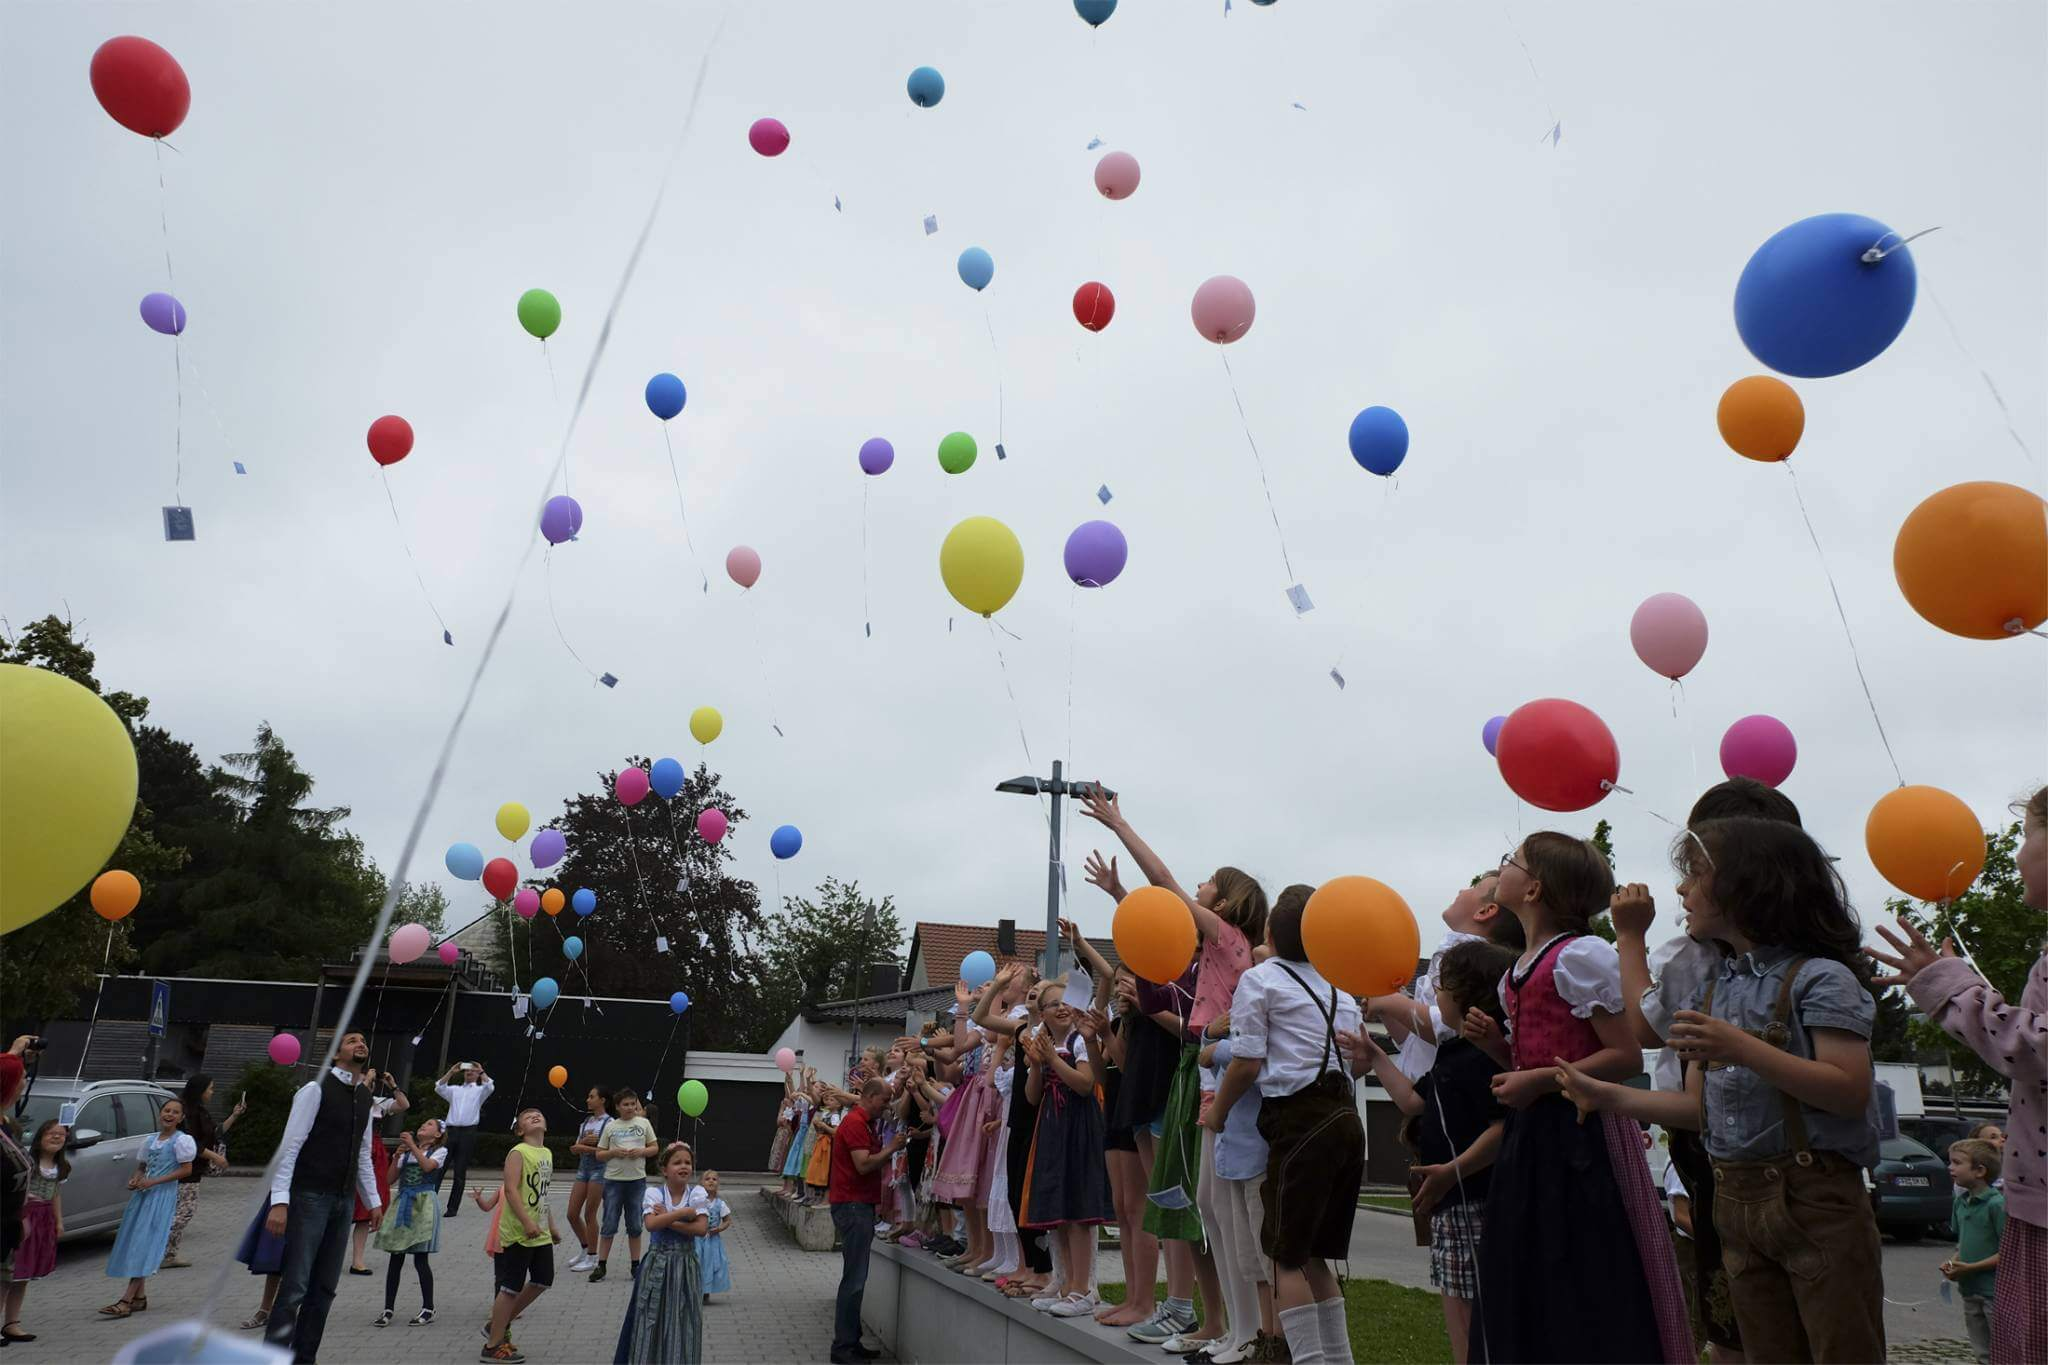 170529-Abschlussfest-Projektwoche-Laurenzer-Grundschule